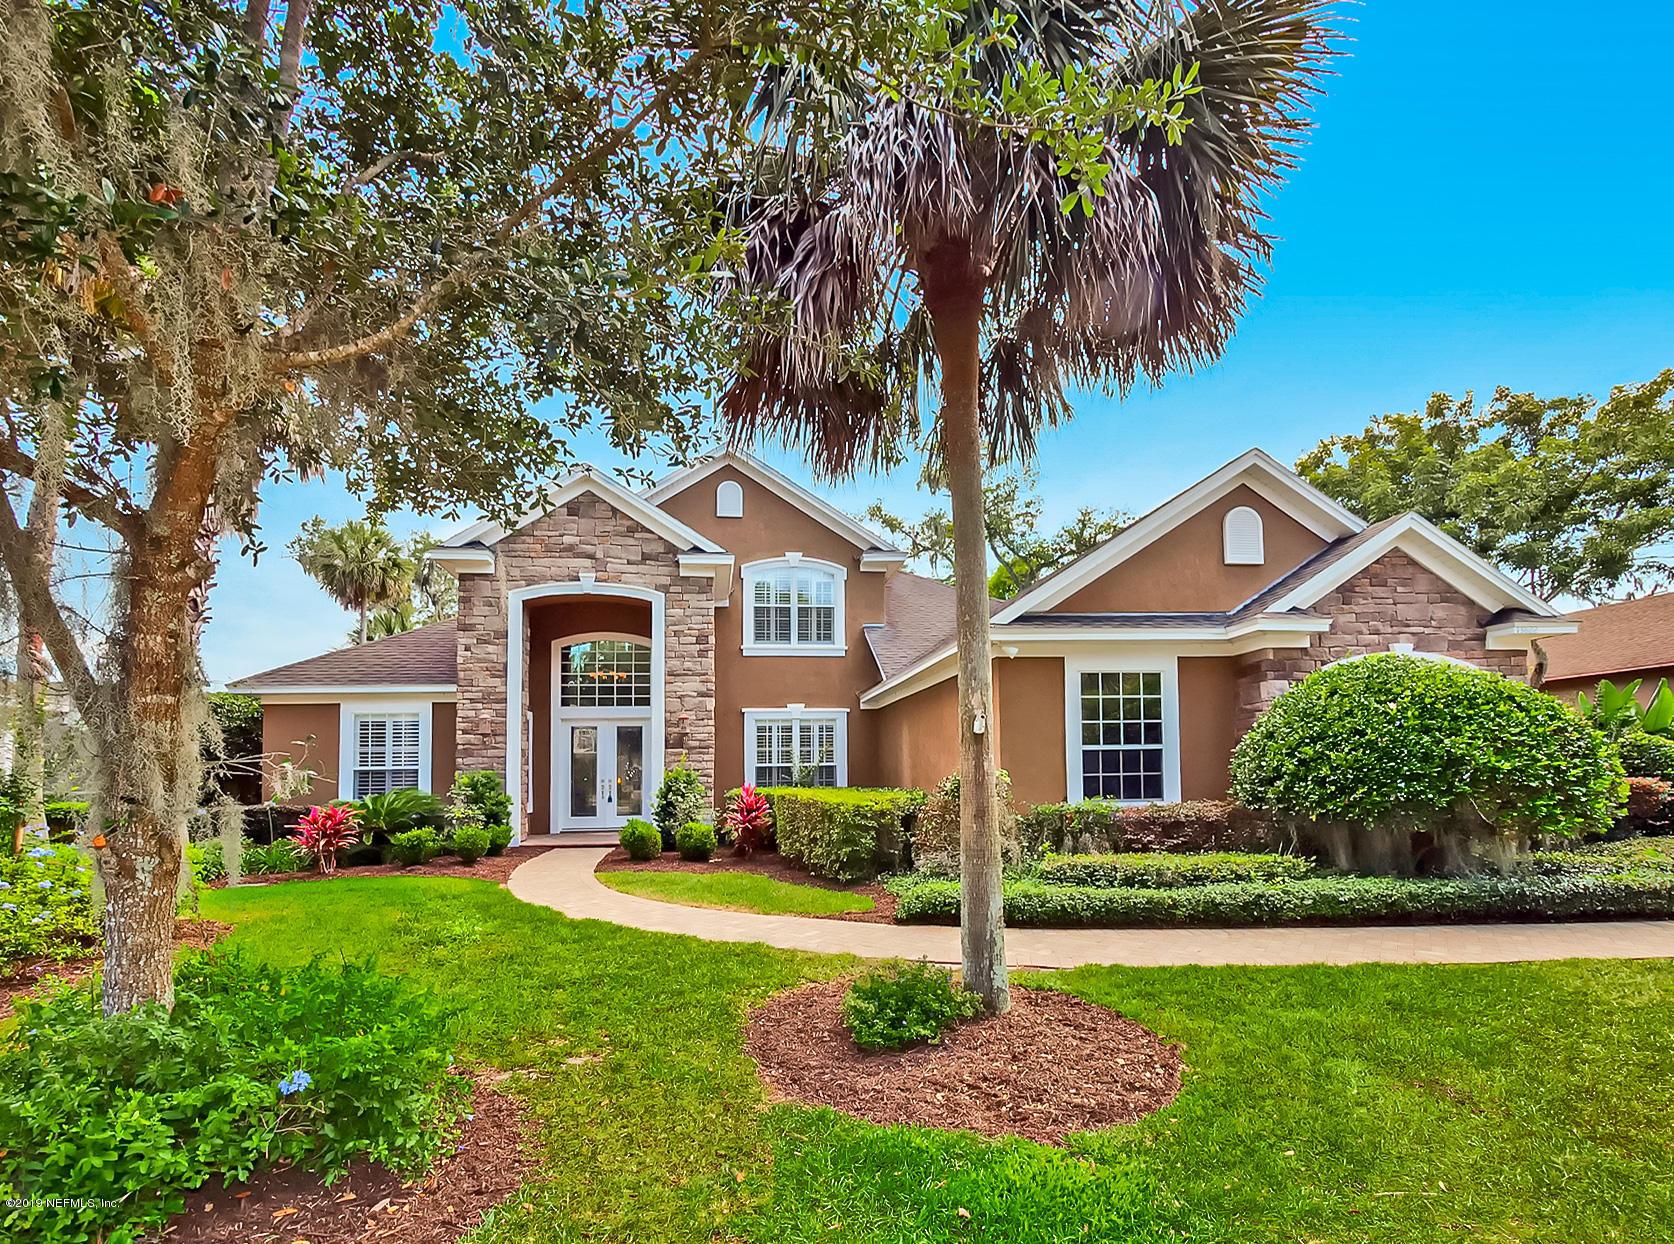 13822 SAXON LAKE, JACKSONVILLE, FLORIDA 32225, 4 Bedrooms Bedrooms, ,3 BathroomsBathrooms,Residential - single family,For sale,SAXON LAKE,996786